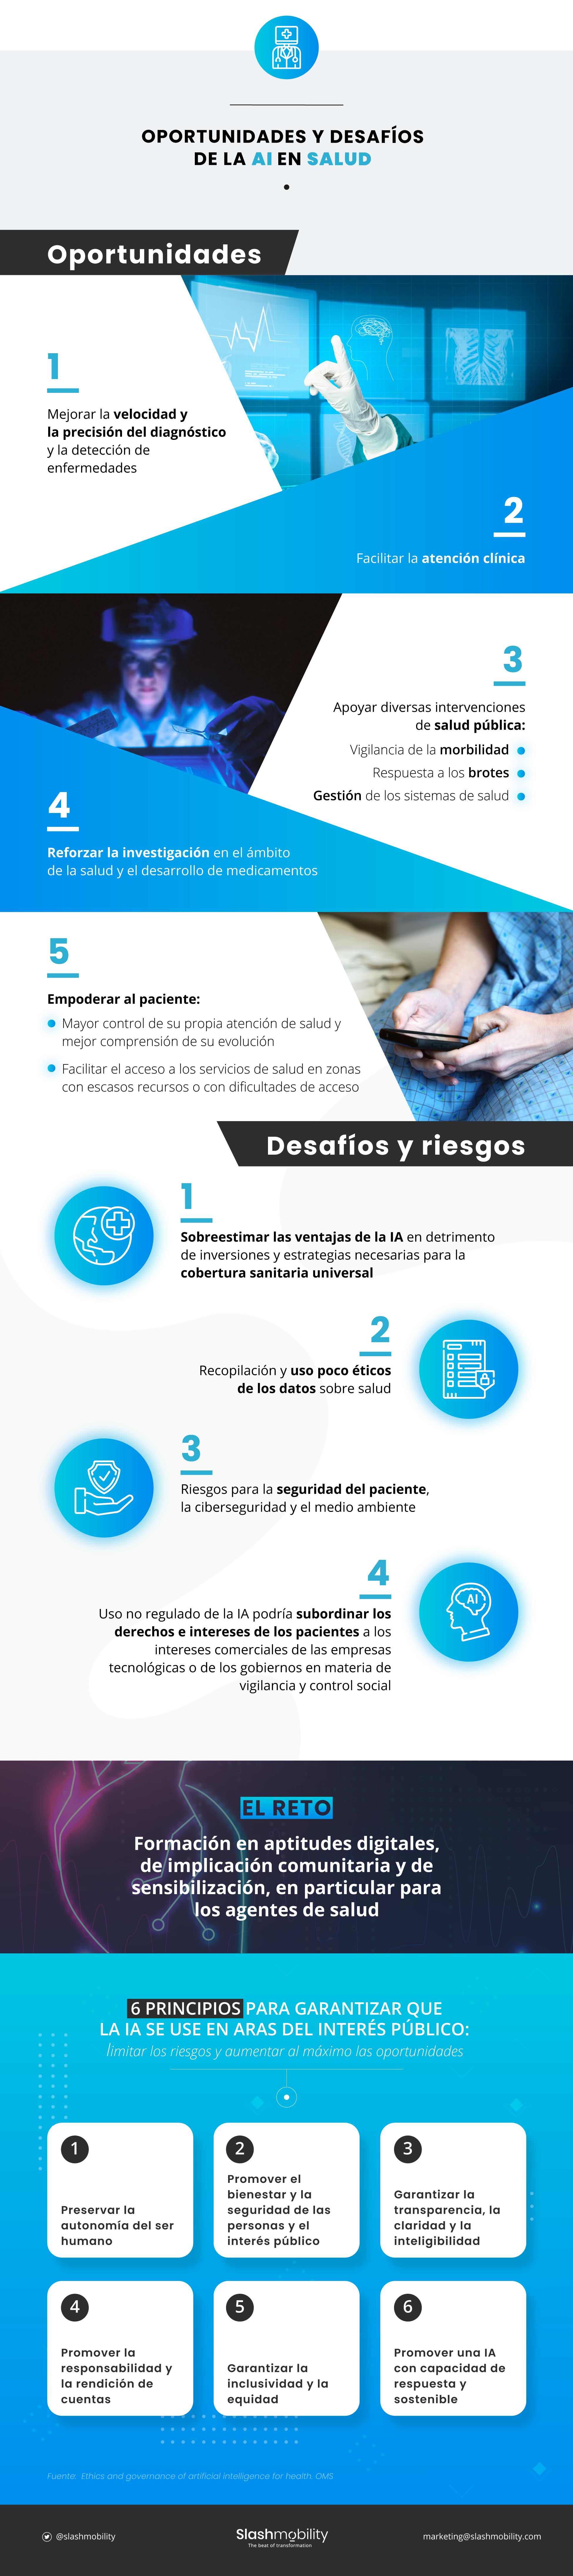 infografia-salud-inteligencia-artificial